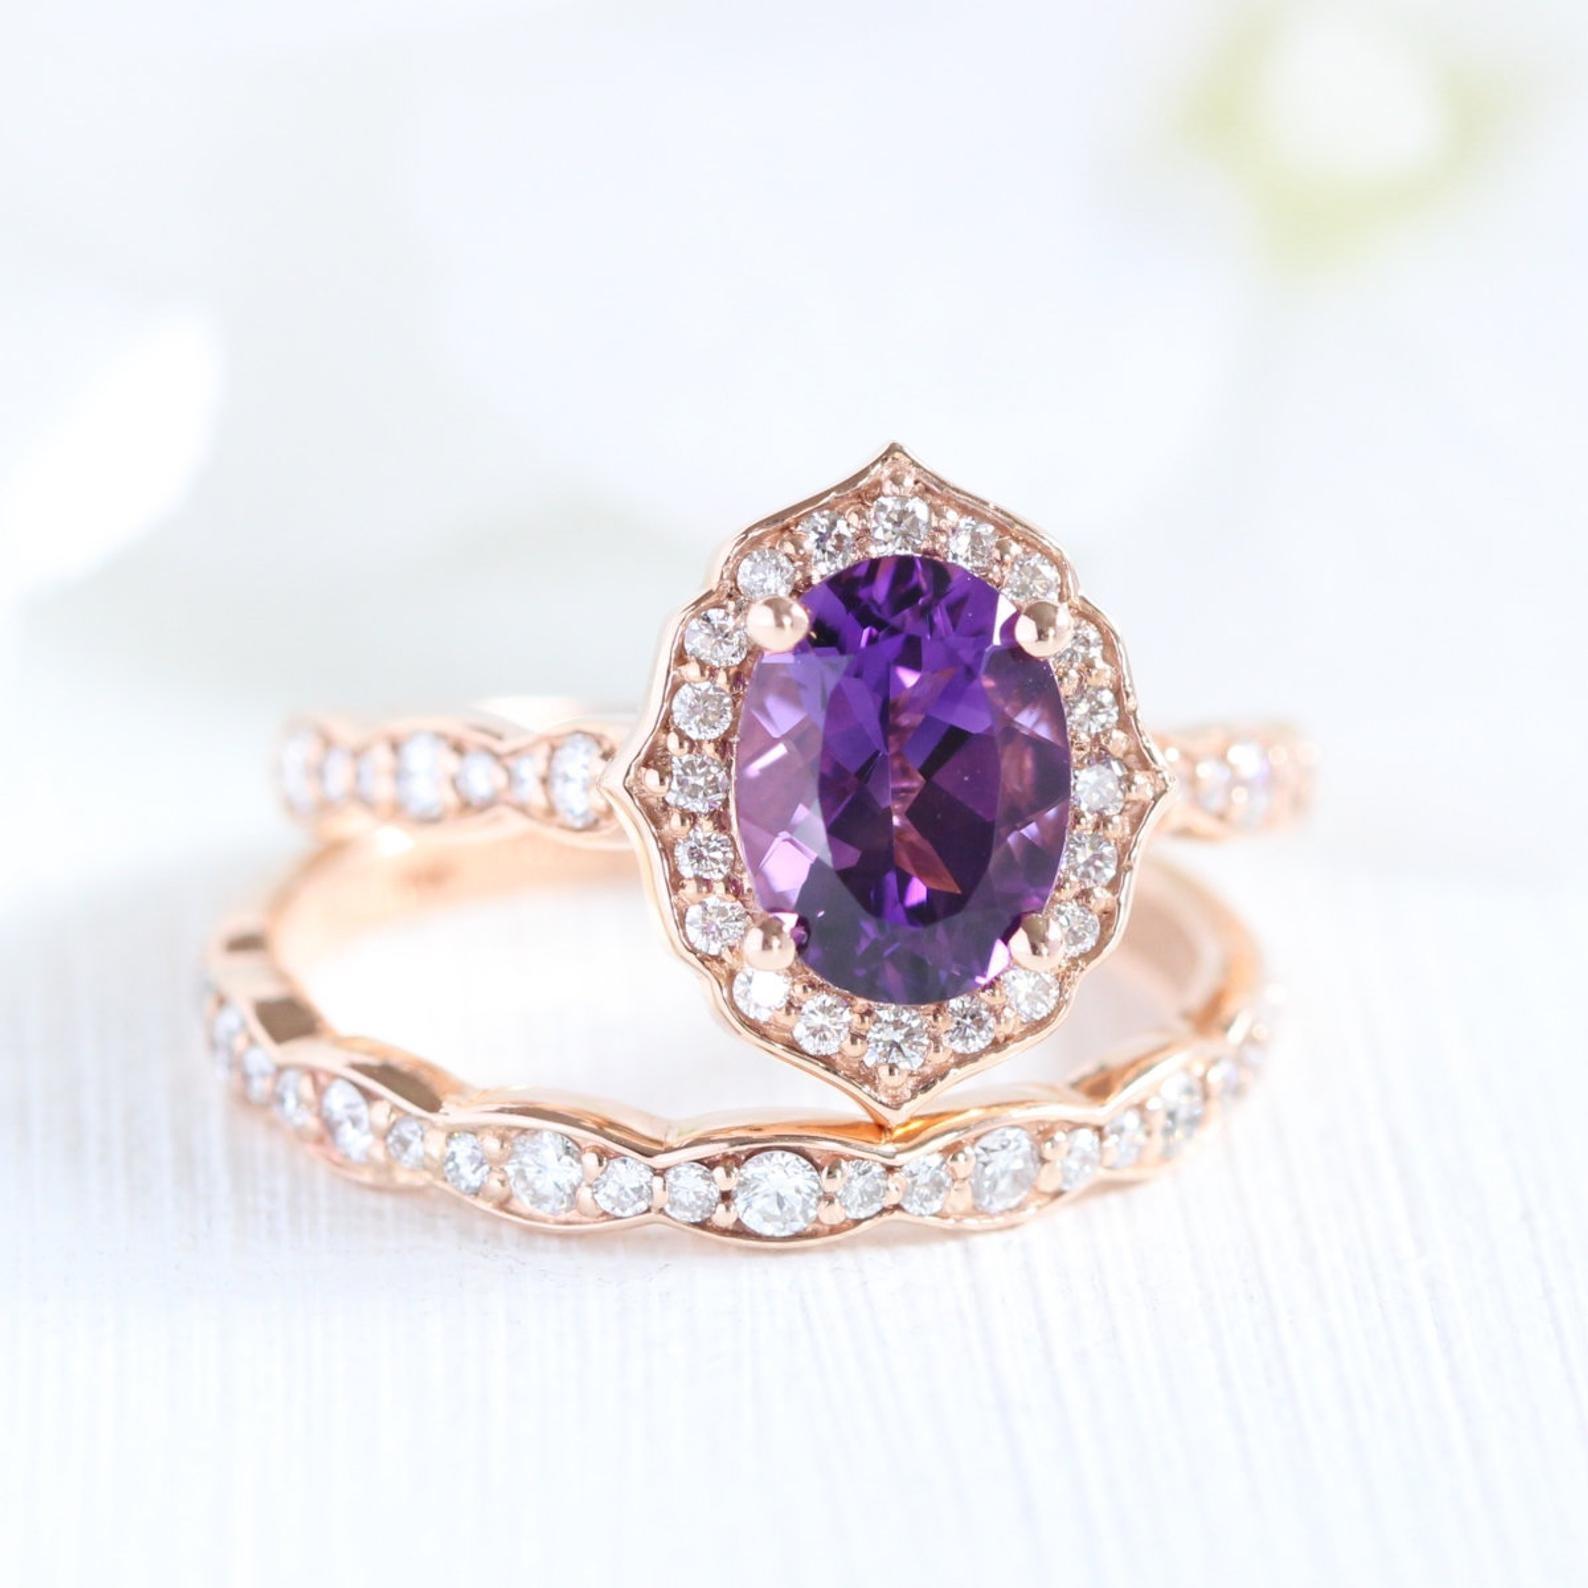 62f613f44 20 Diamond-Alternative Gemstones for Engagement Rings